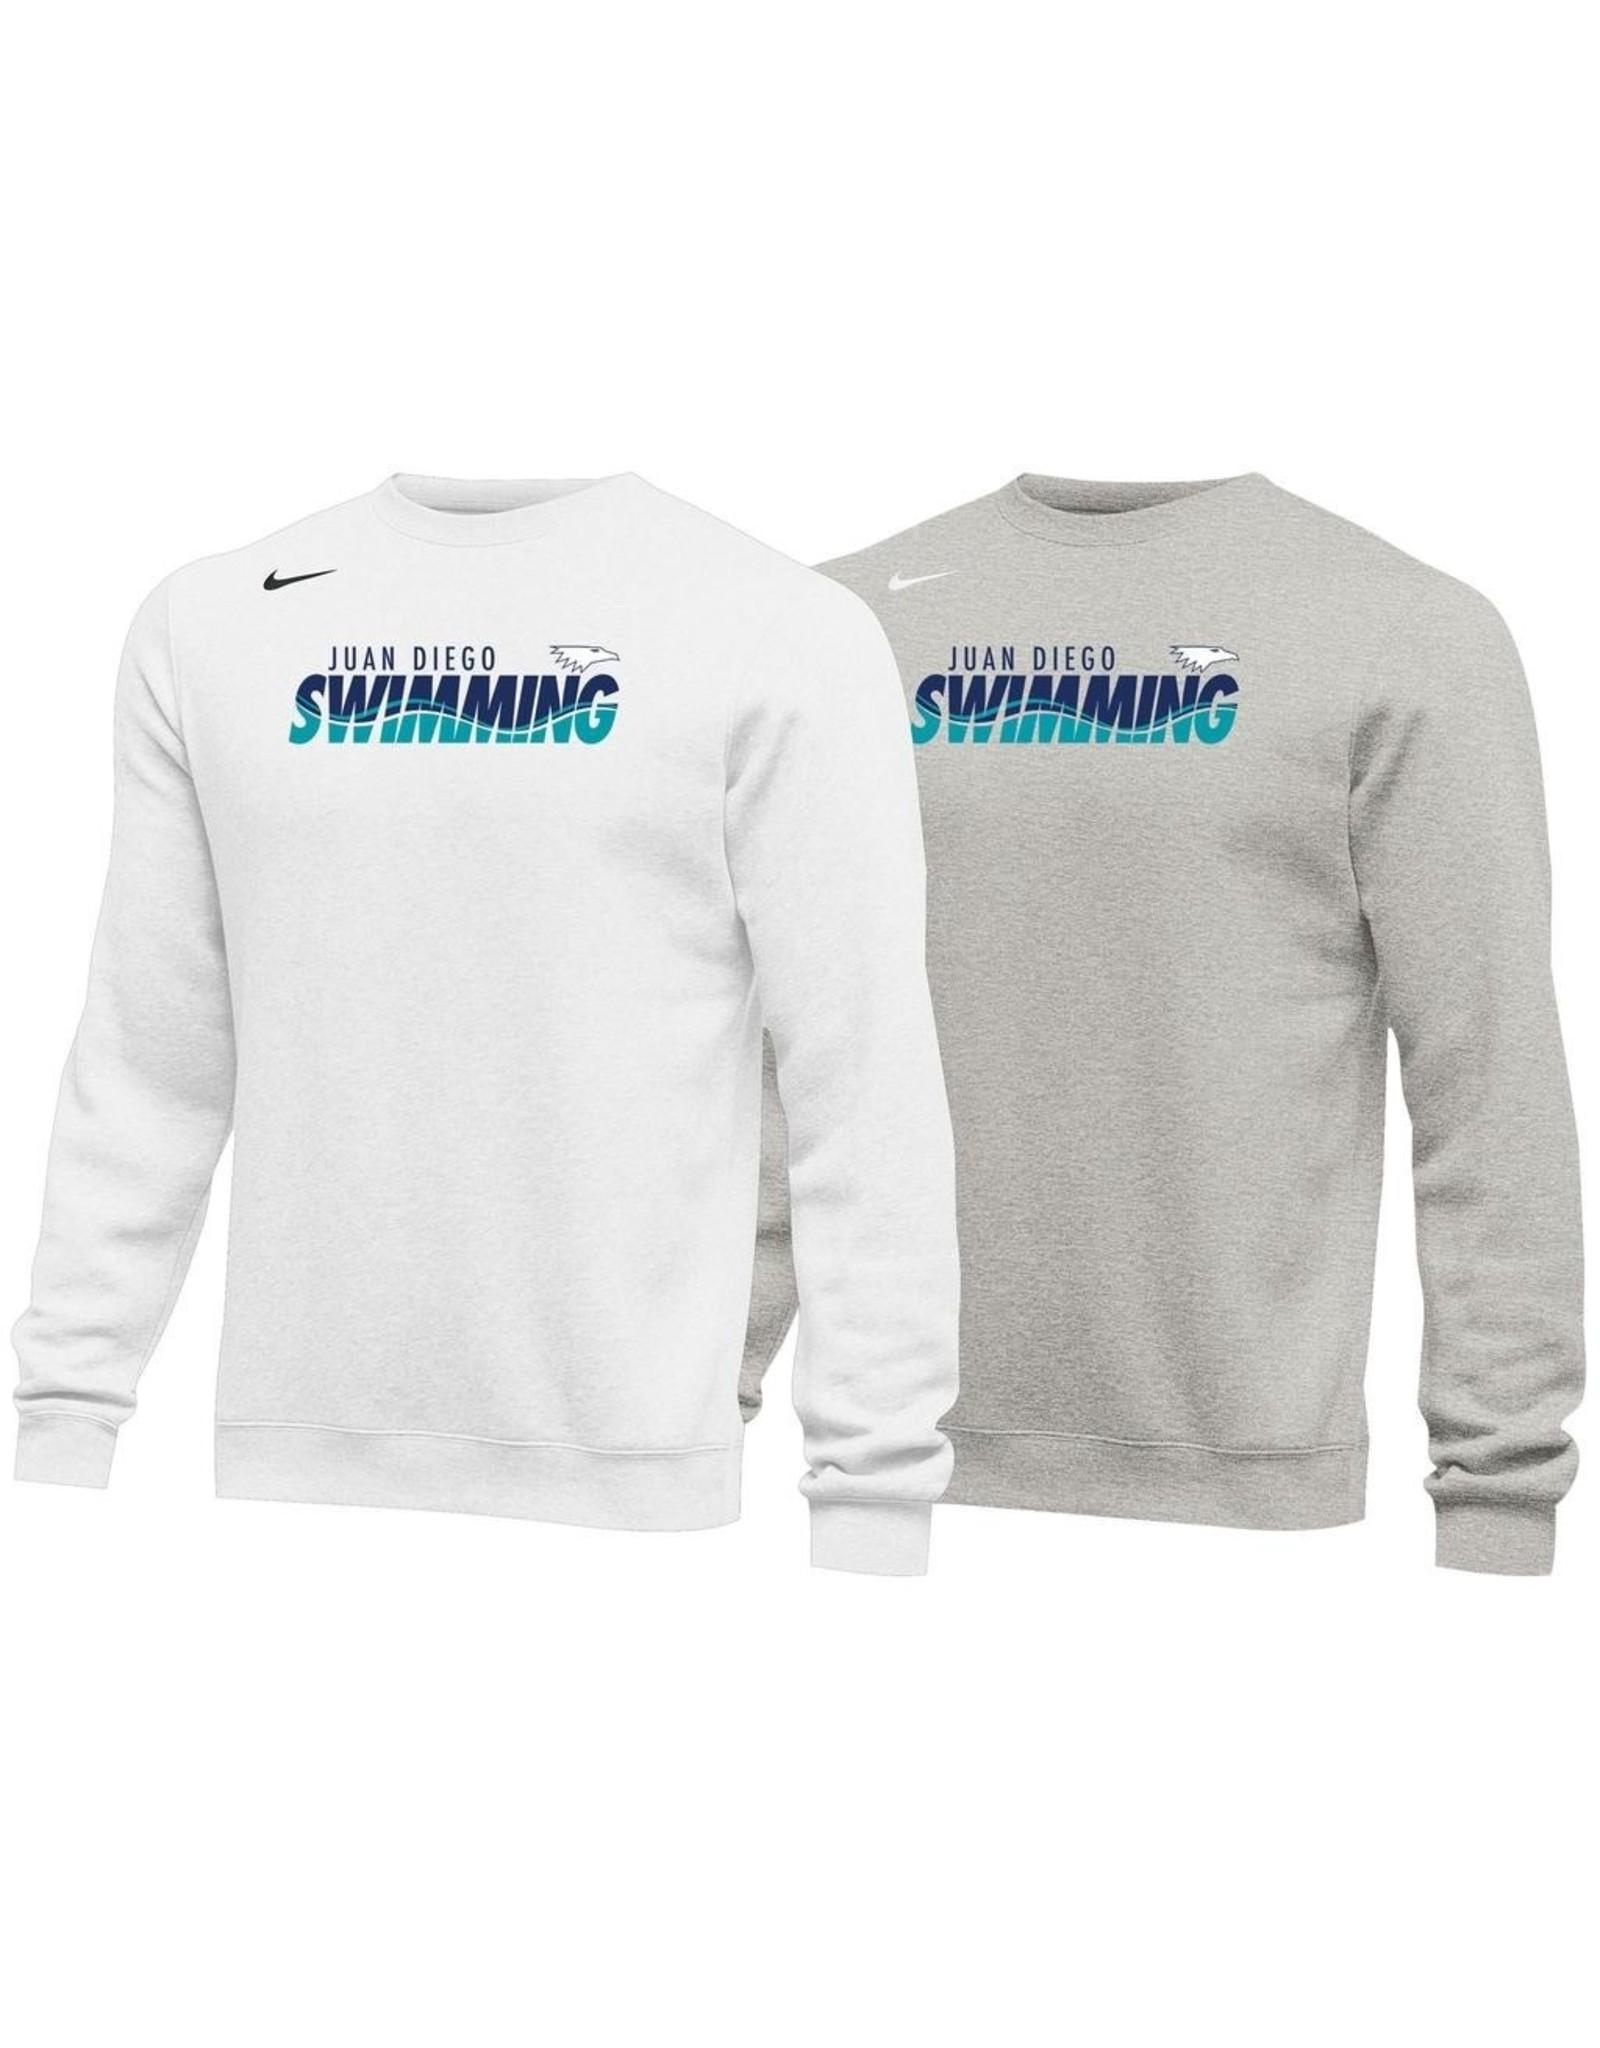 NON-UNIFORM JD Swim Nike Crew Neck Sweatshirt  835589